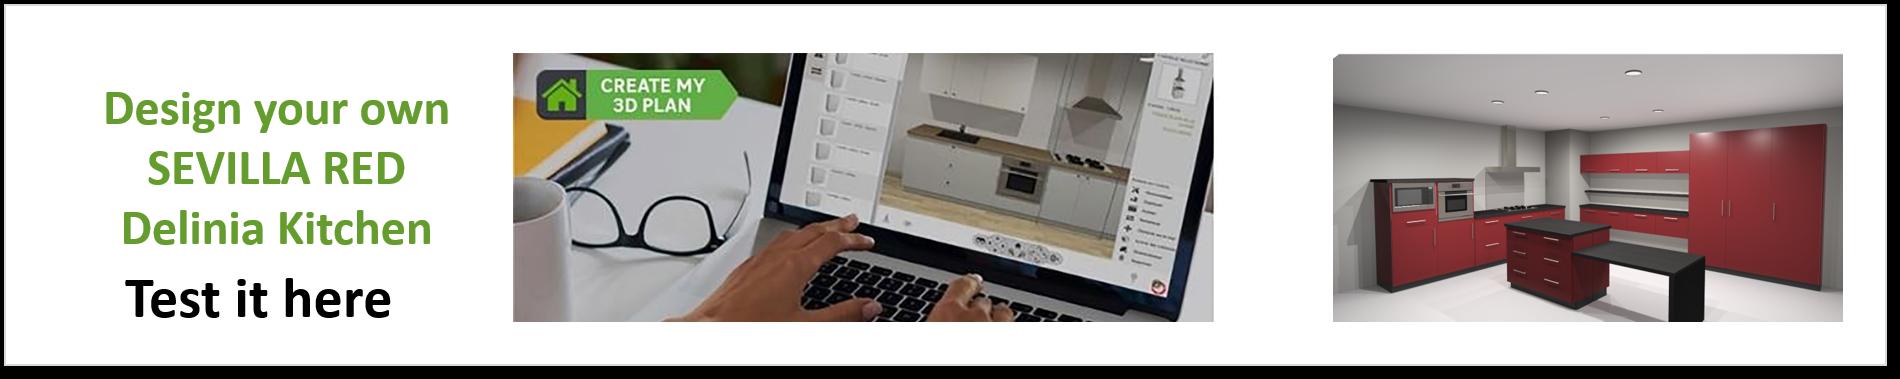 Create or Design your own Delinia Sevilla Red Designer Kitchen